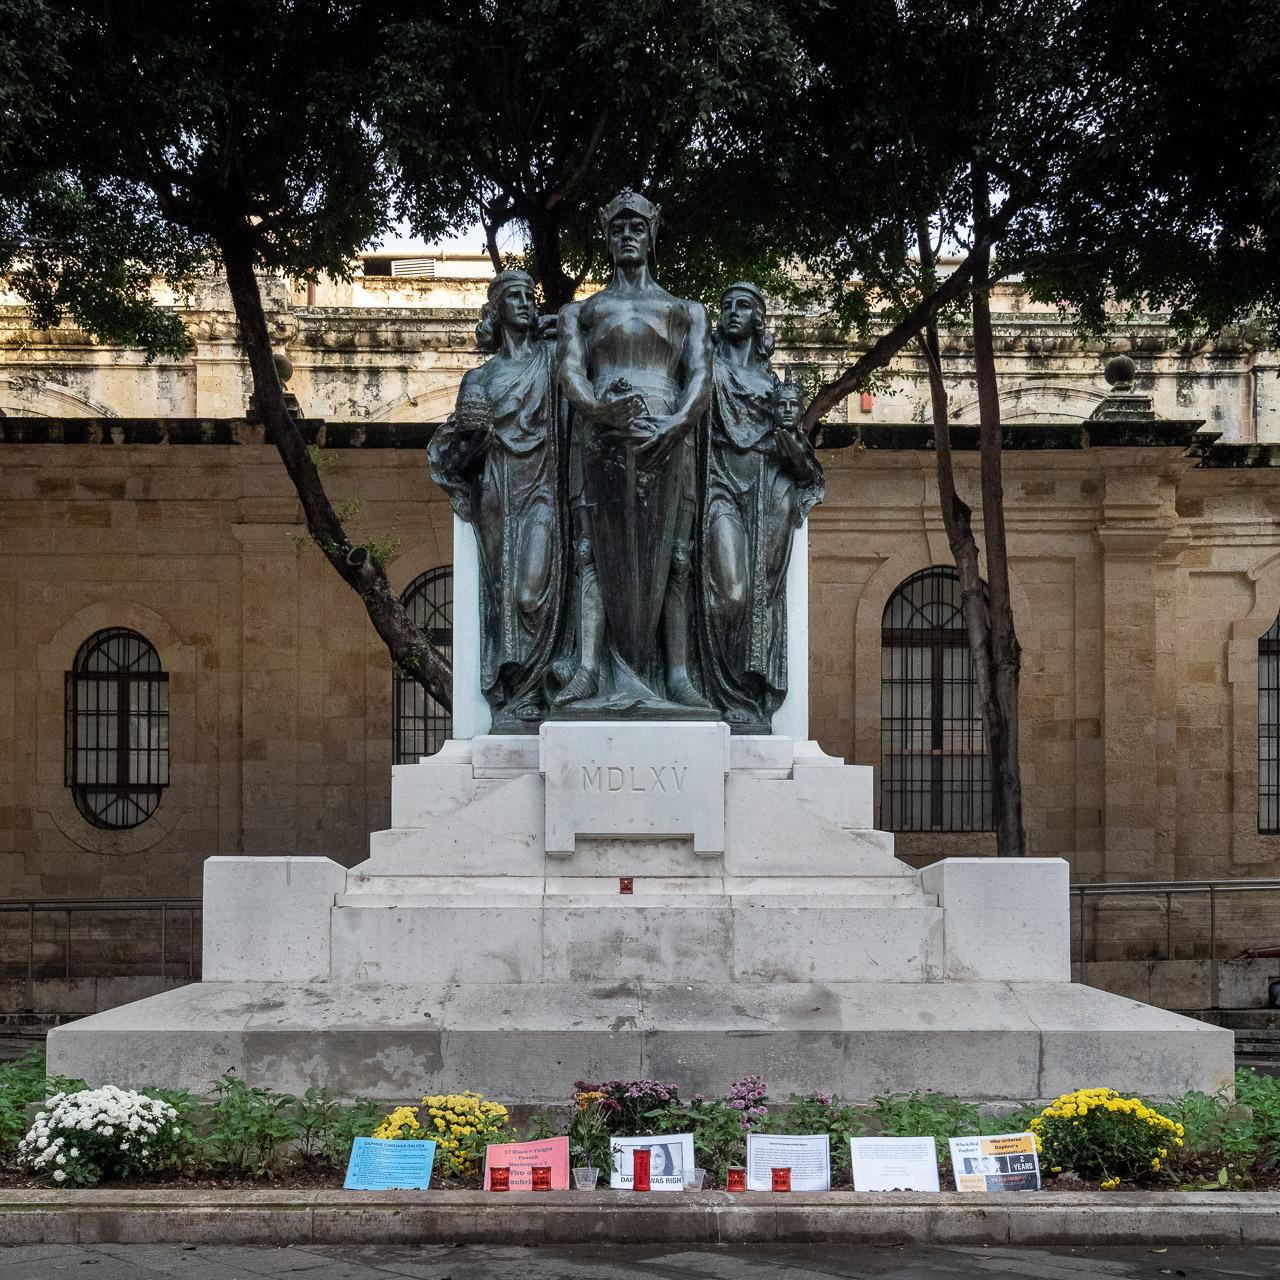 The Daphne Caruana Galizia Memorial